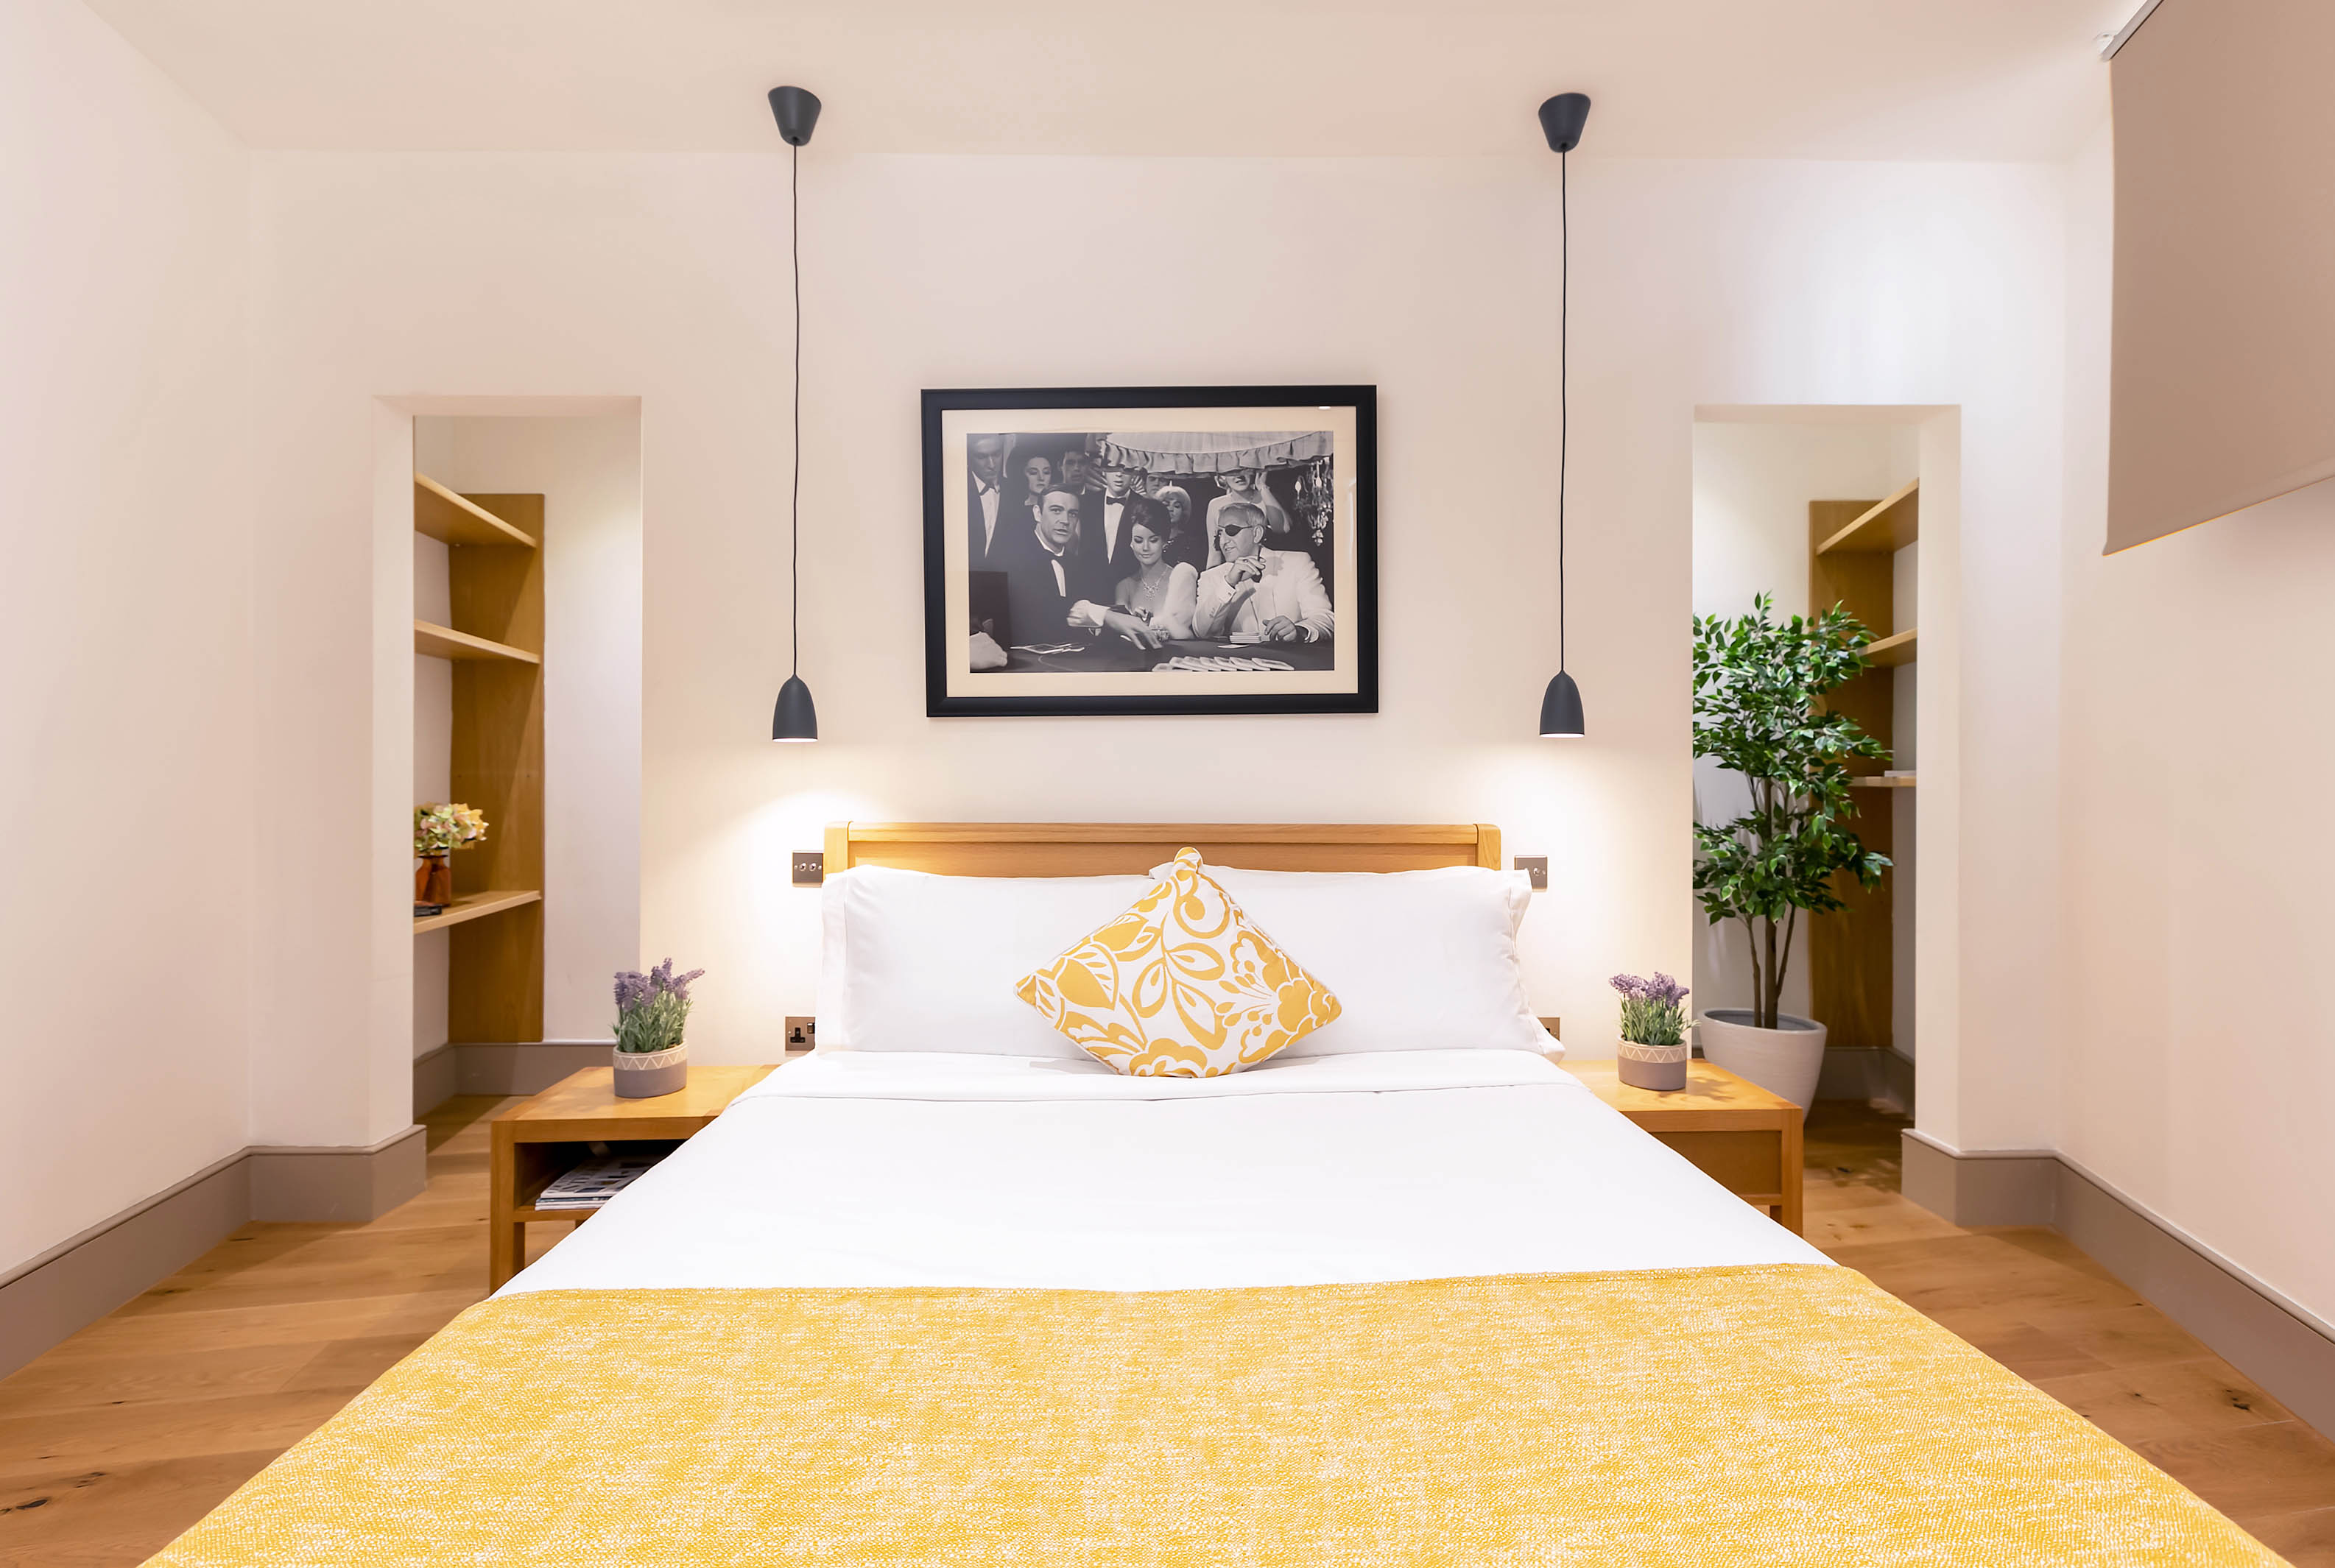 Lovelydays luxury service apartment rental - London - Fitzrovia - Wells Mews B - Lovelysuite - 2 bedrooms - 2 bathrooms - Double bed - 7b0ca5c00405 - Lovelydays